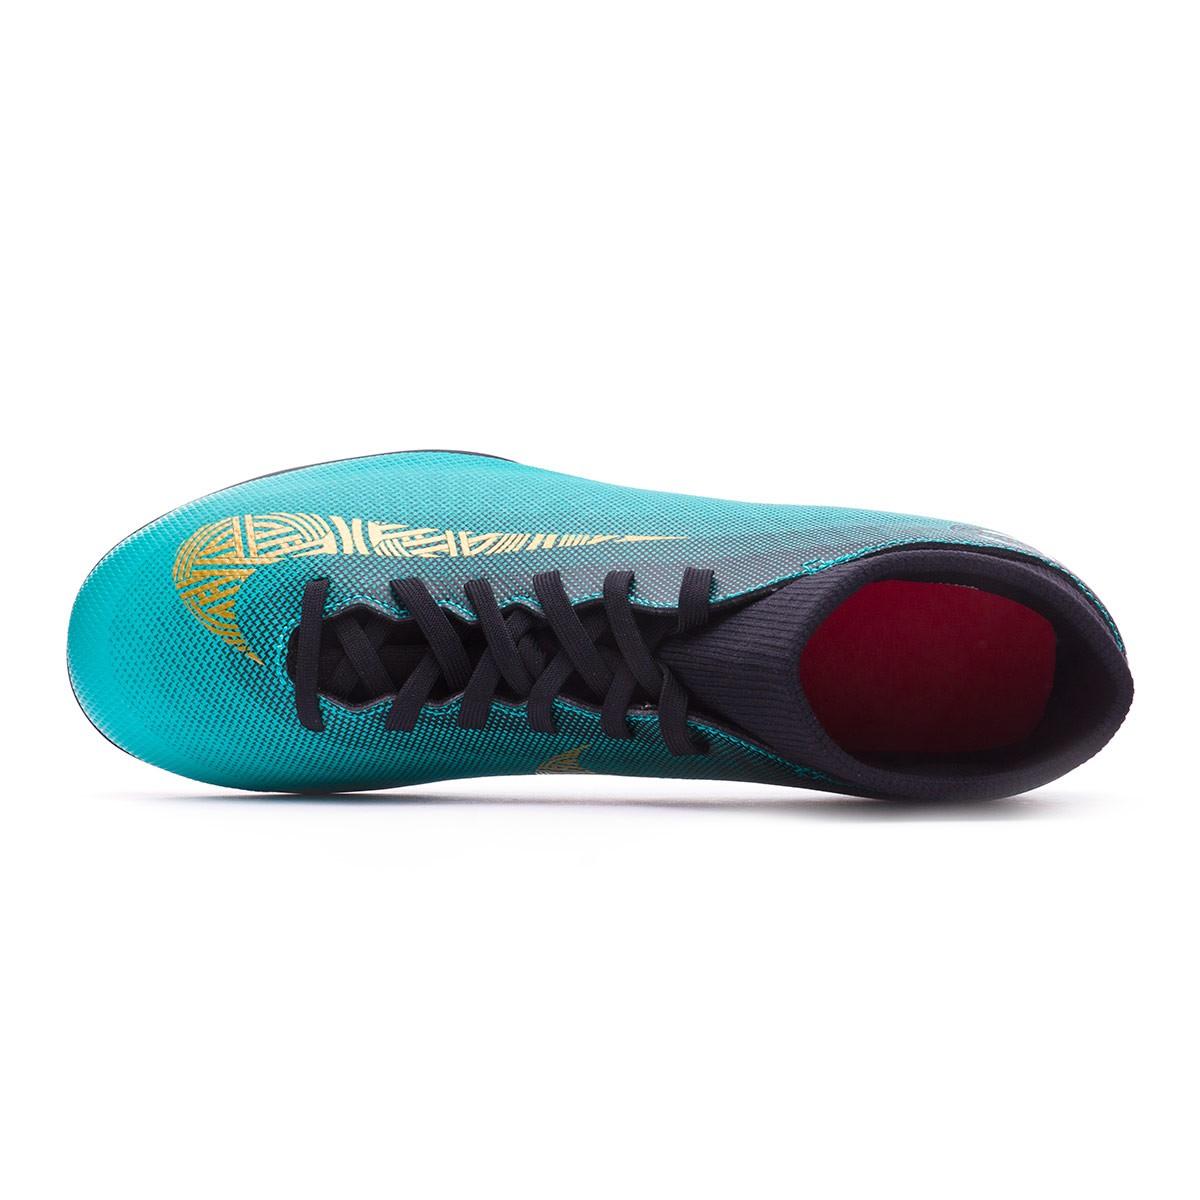 wholesale dealer 33c28 b193a Football Boots Nike Mercurial Superfly VI Club CR7 MG Clear ...